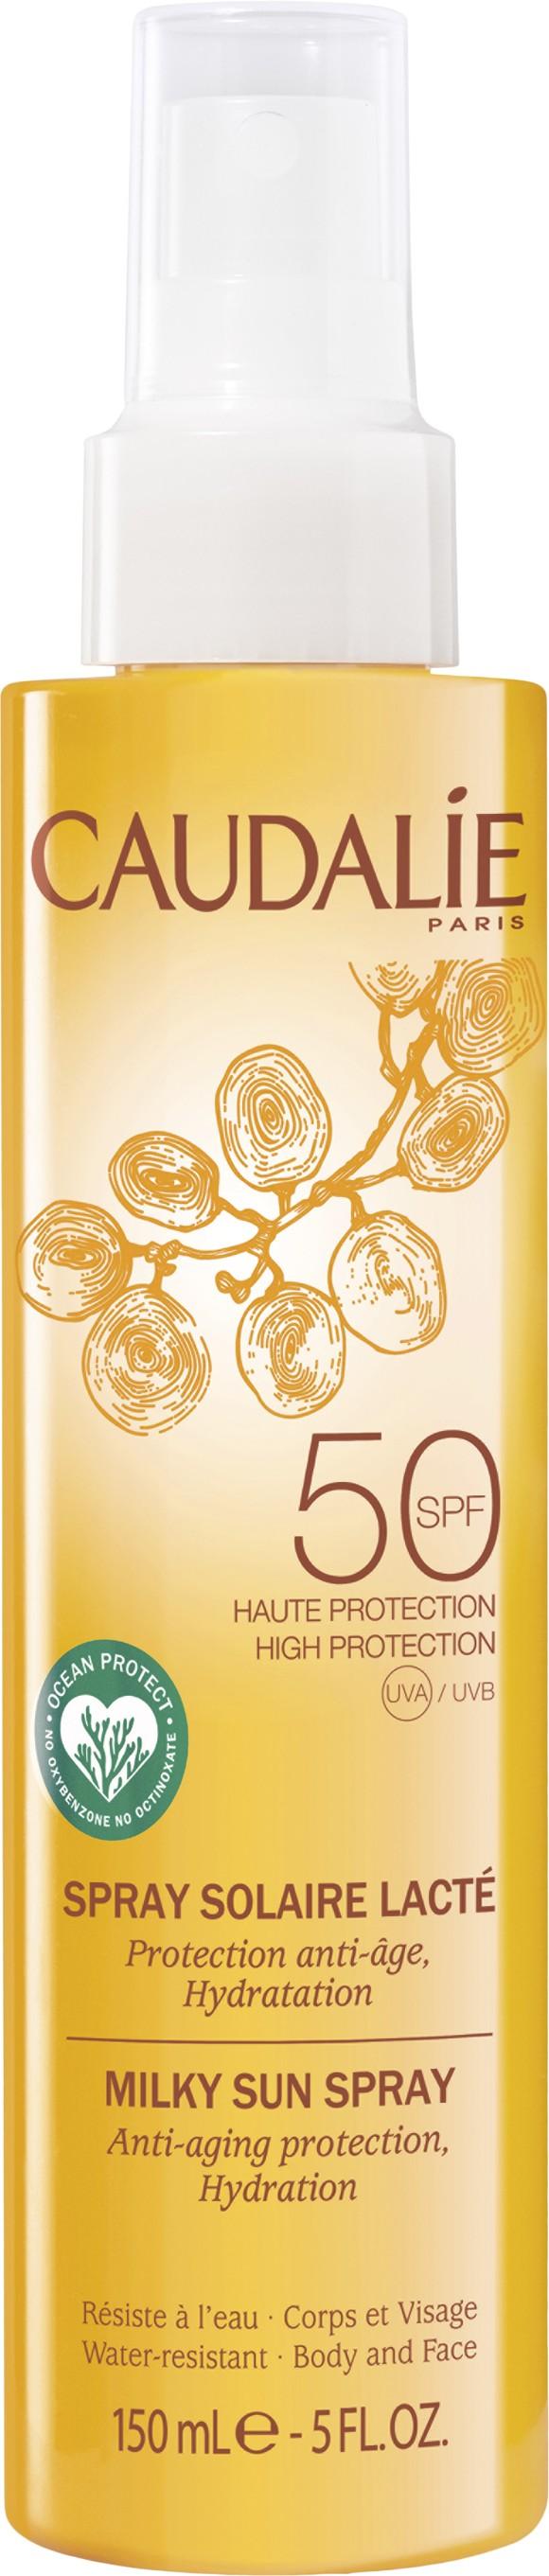 Caudalie - Milky Sun Spray SPF 50 150 ml